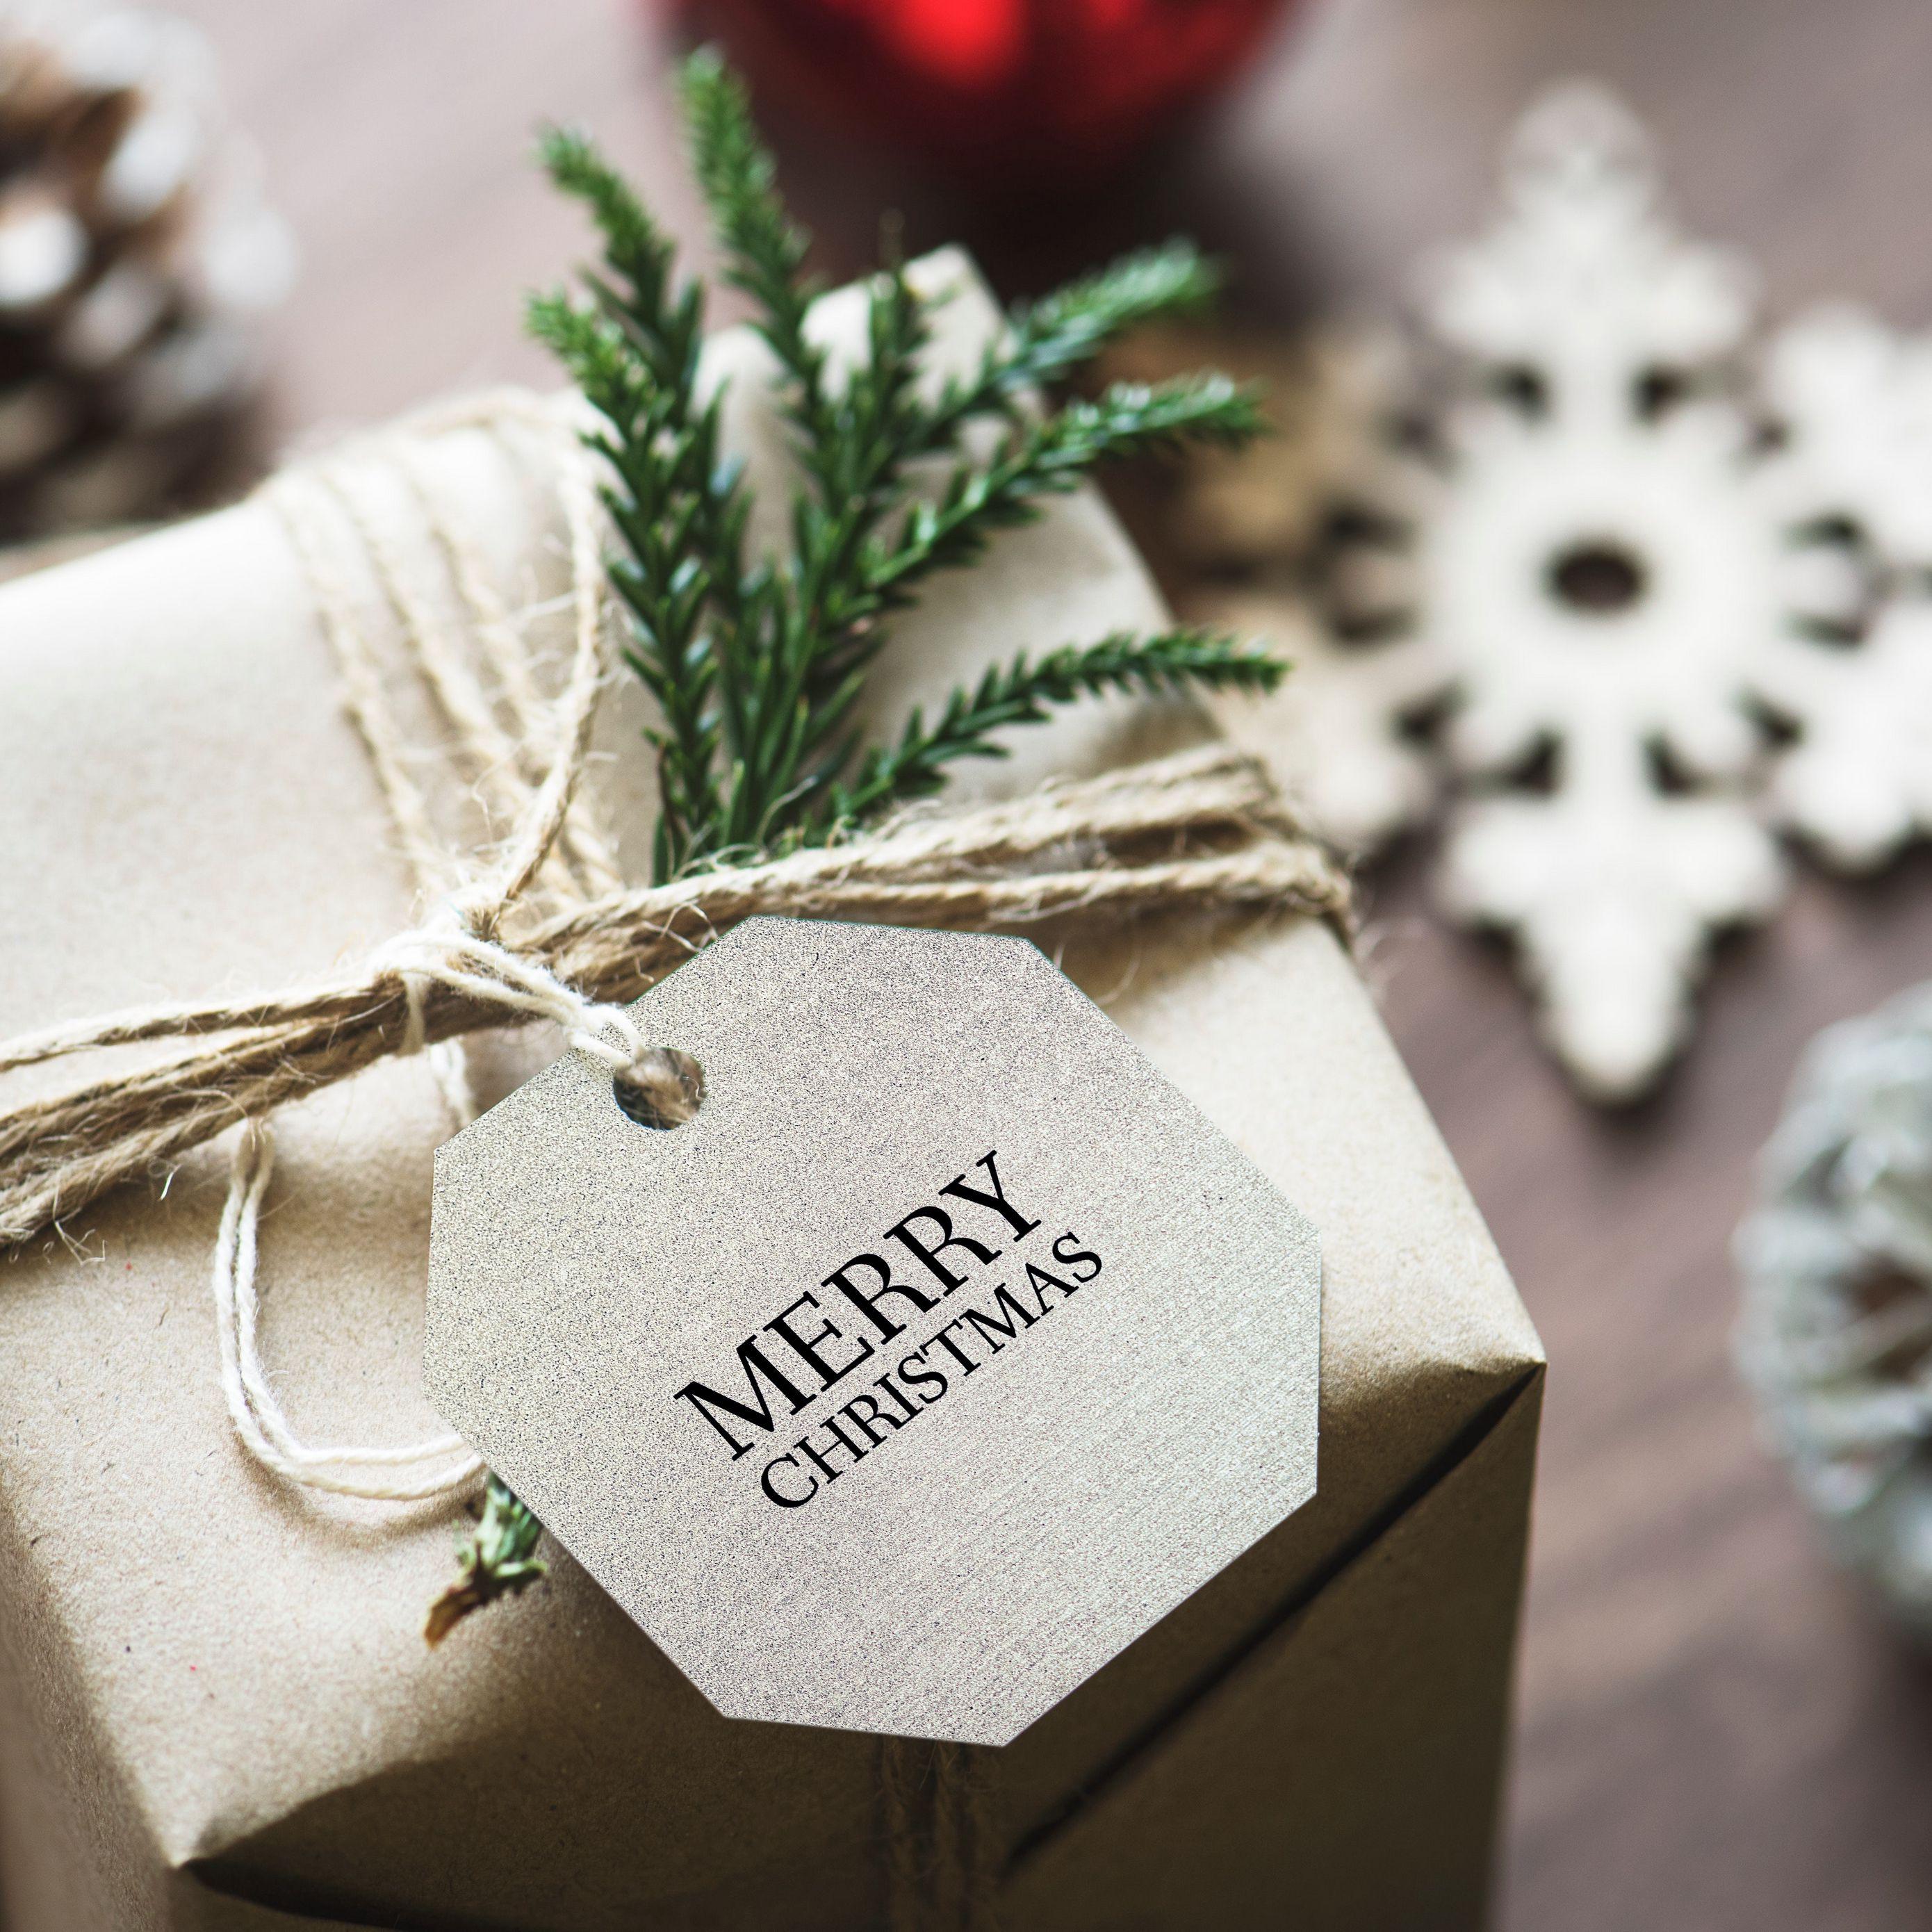 2780x2780 Wallpaper gift, christmas, new year, tag, box